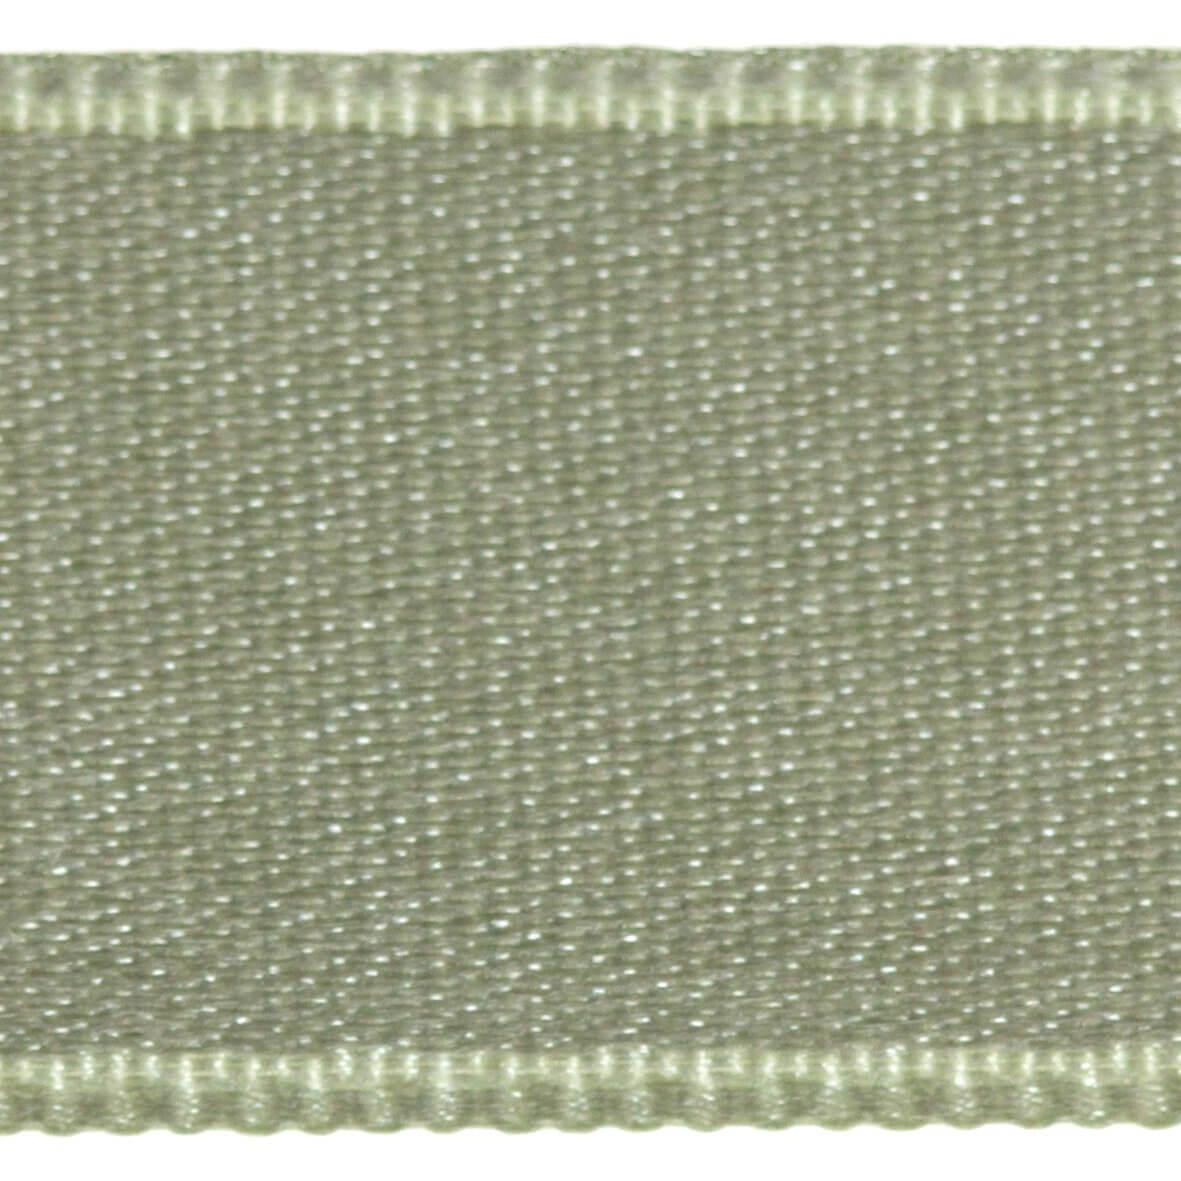 Light Cedar Col. 547 - 10mm Satab Satin Ribbon